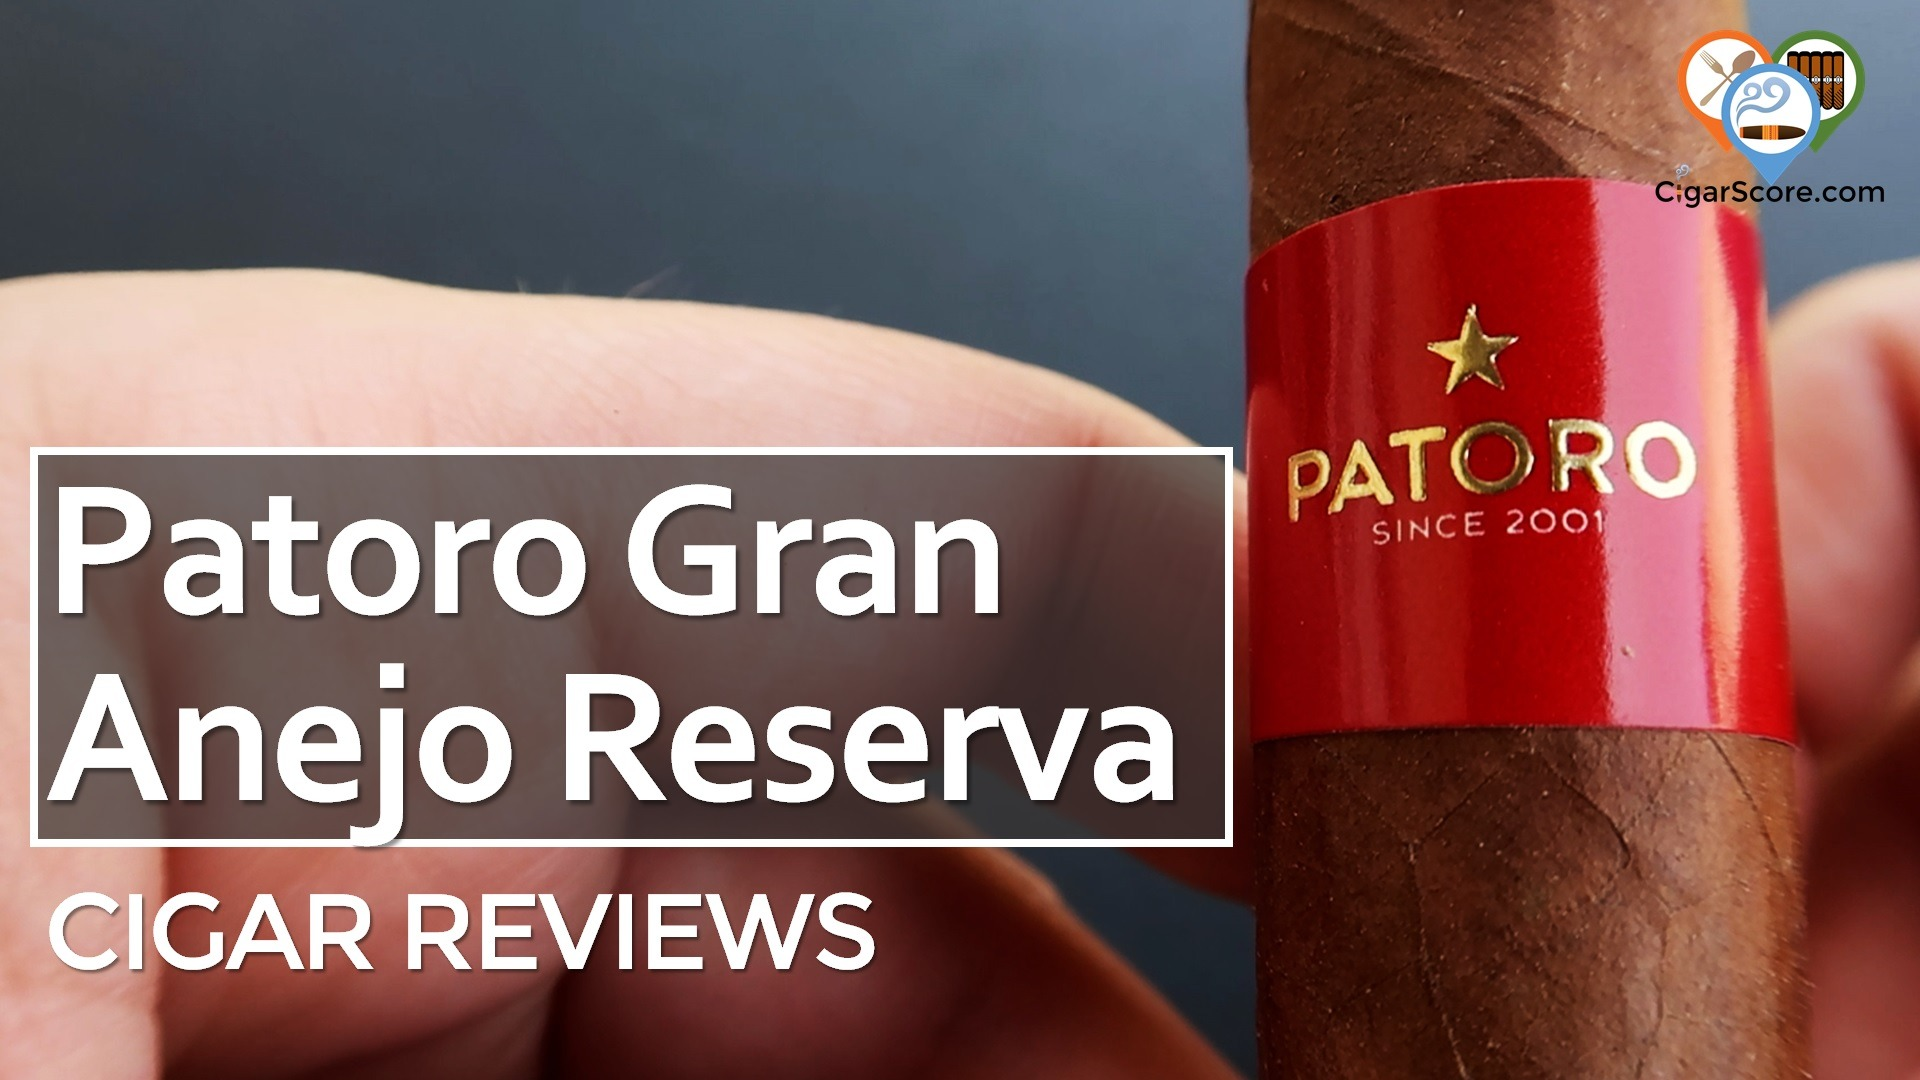 Cigar Review - Patoro Gran Anejo Reserva Churchill